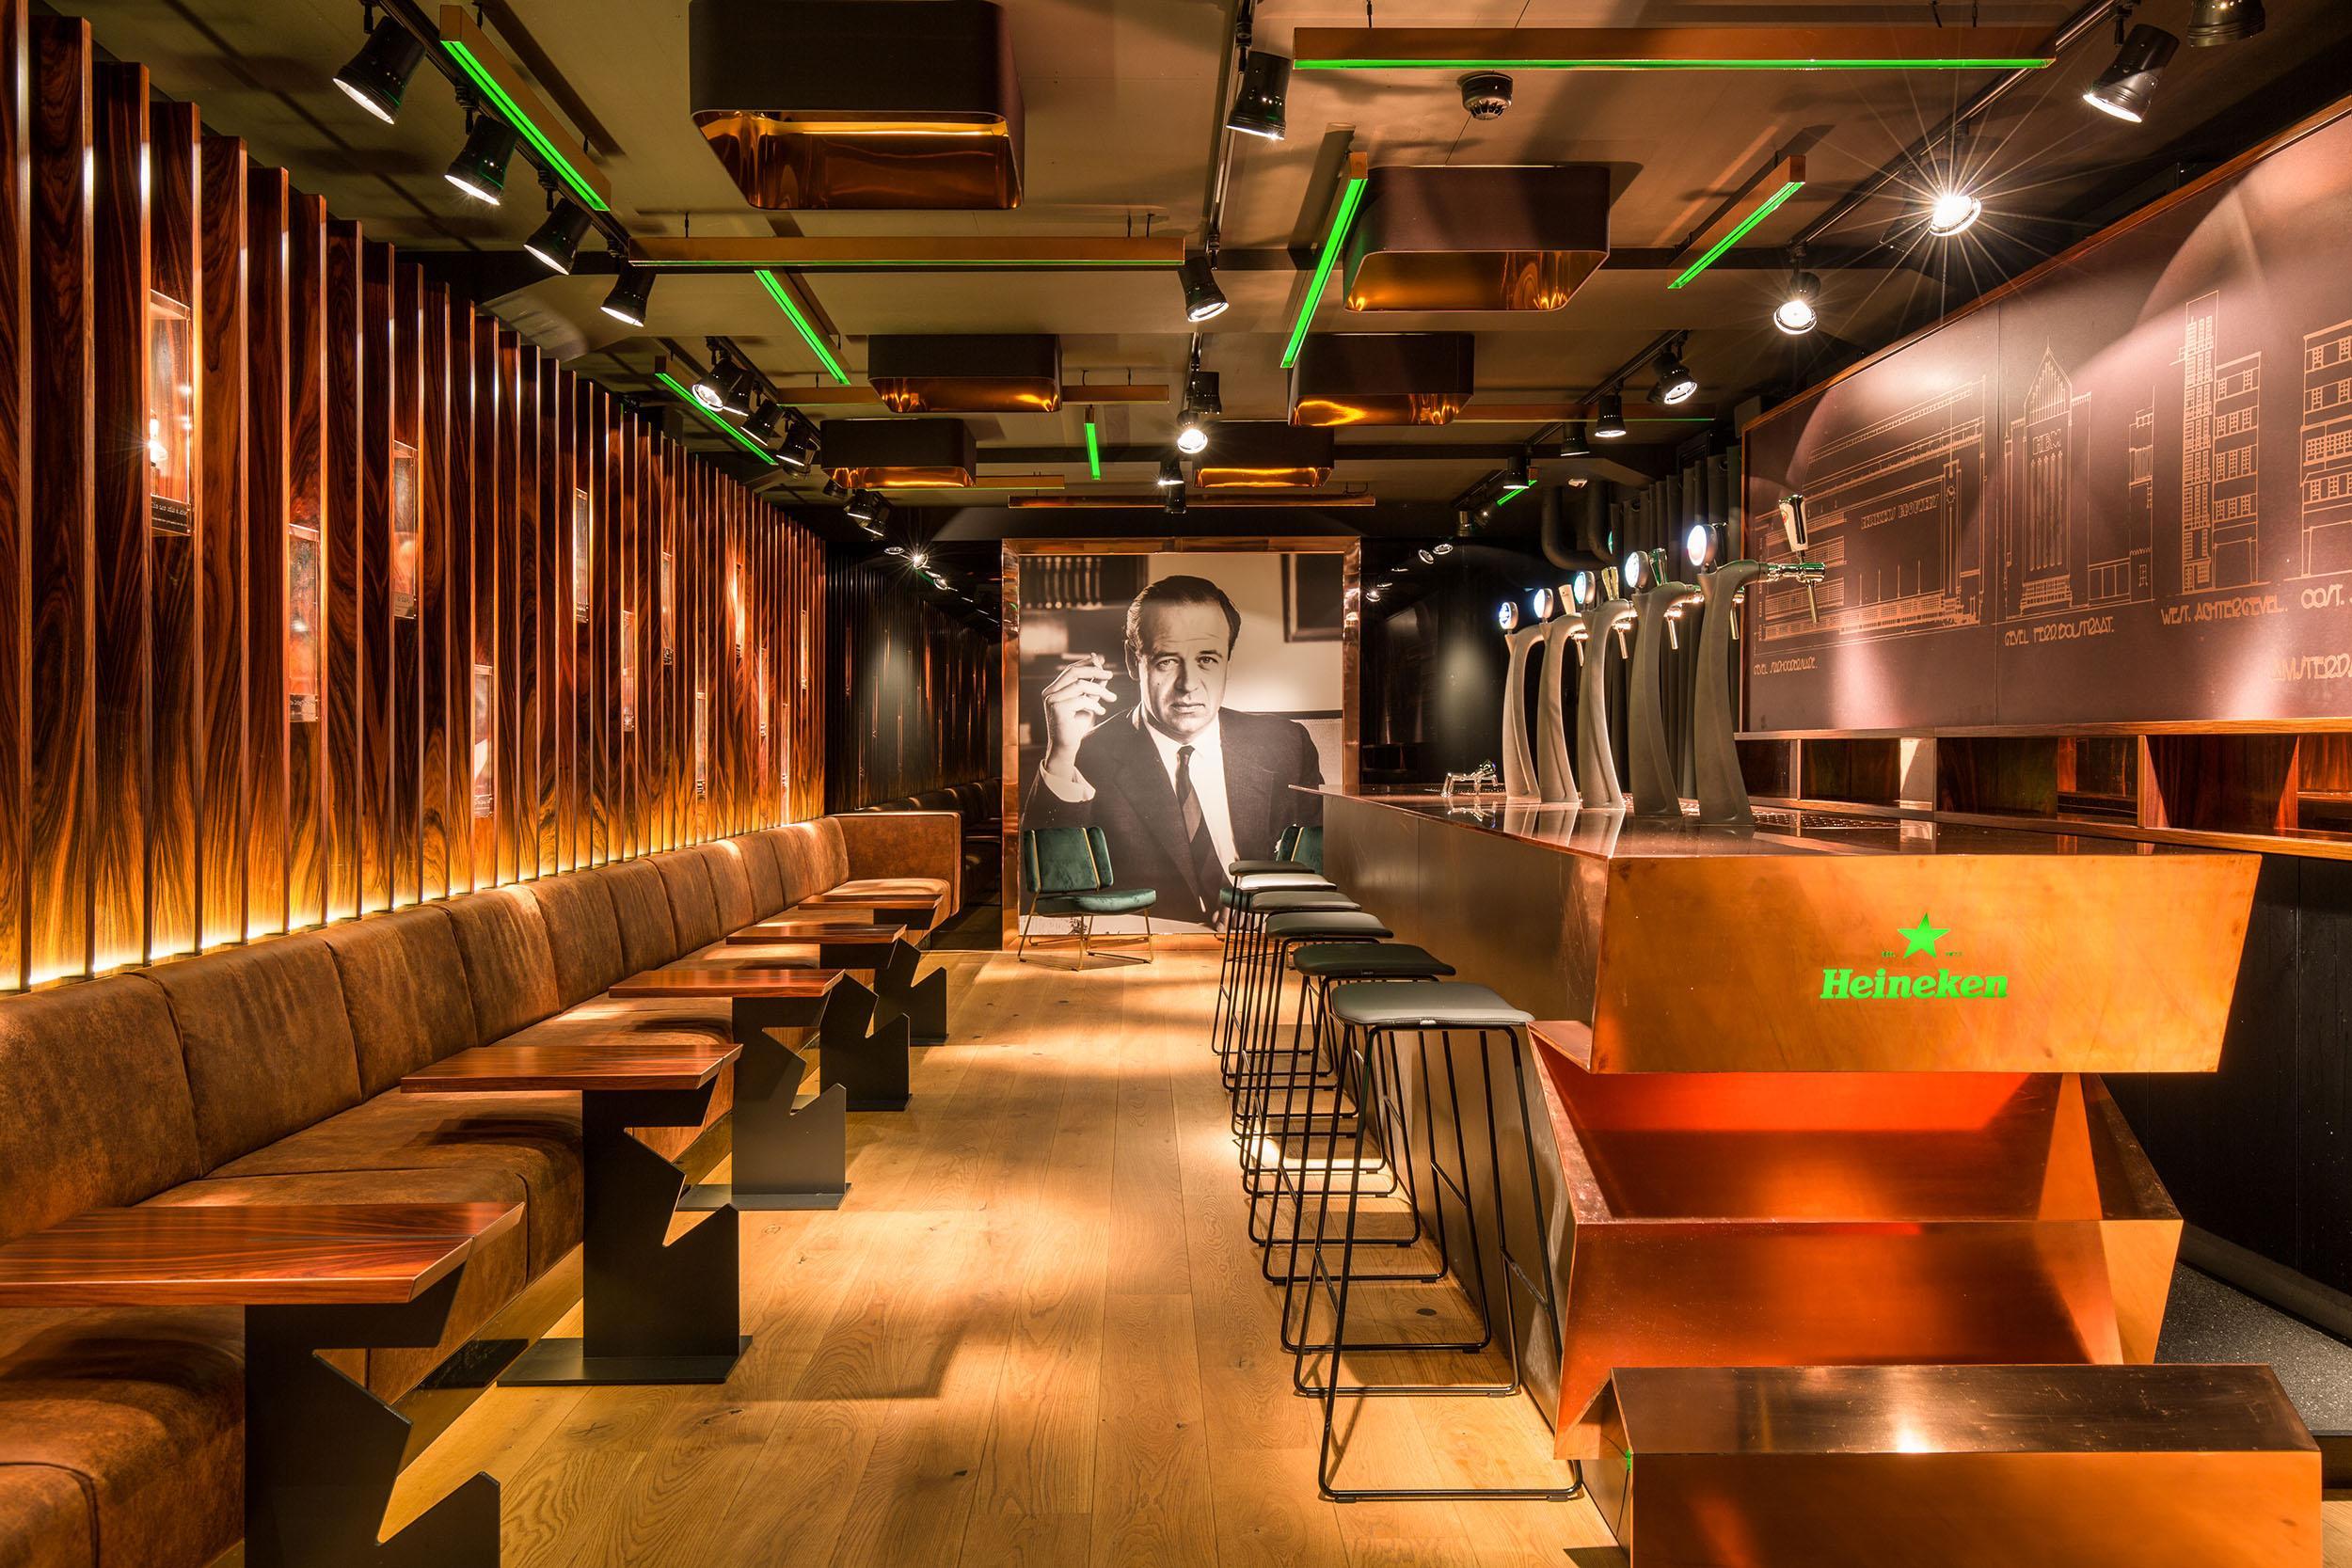 Freddy's VIP Bar at the Heineken Experience in Amsterdam (©Twycer/Heineken)